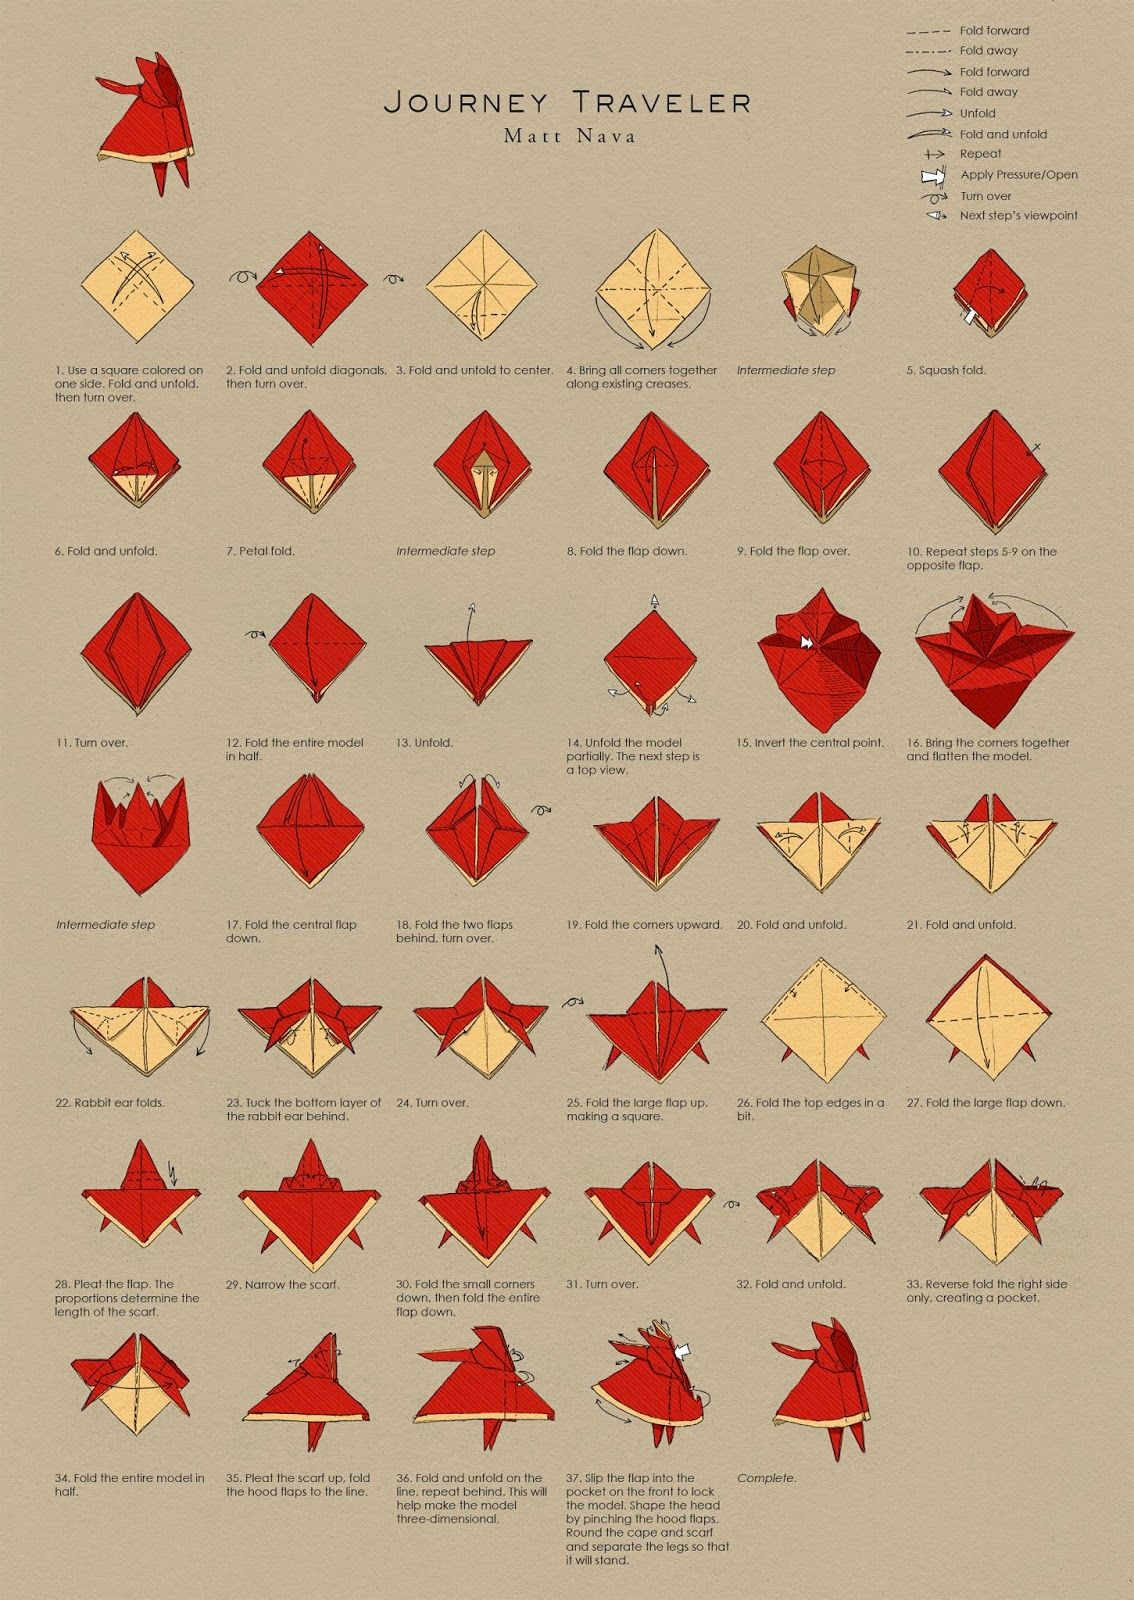 Matt Nava Journey Traveler Origami Diagrams Origami Diagrams Origami Crafts Origami Design